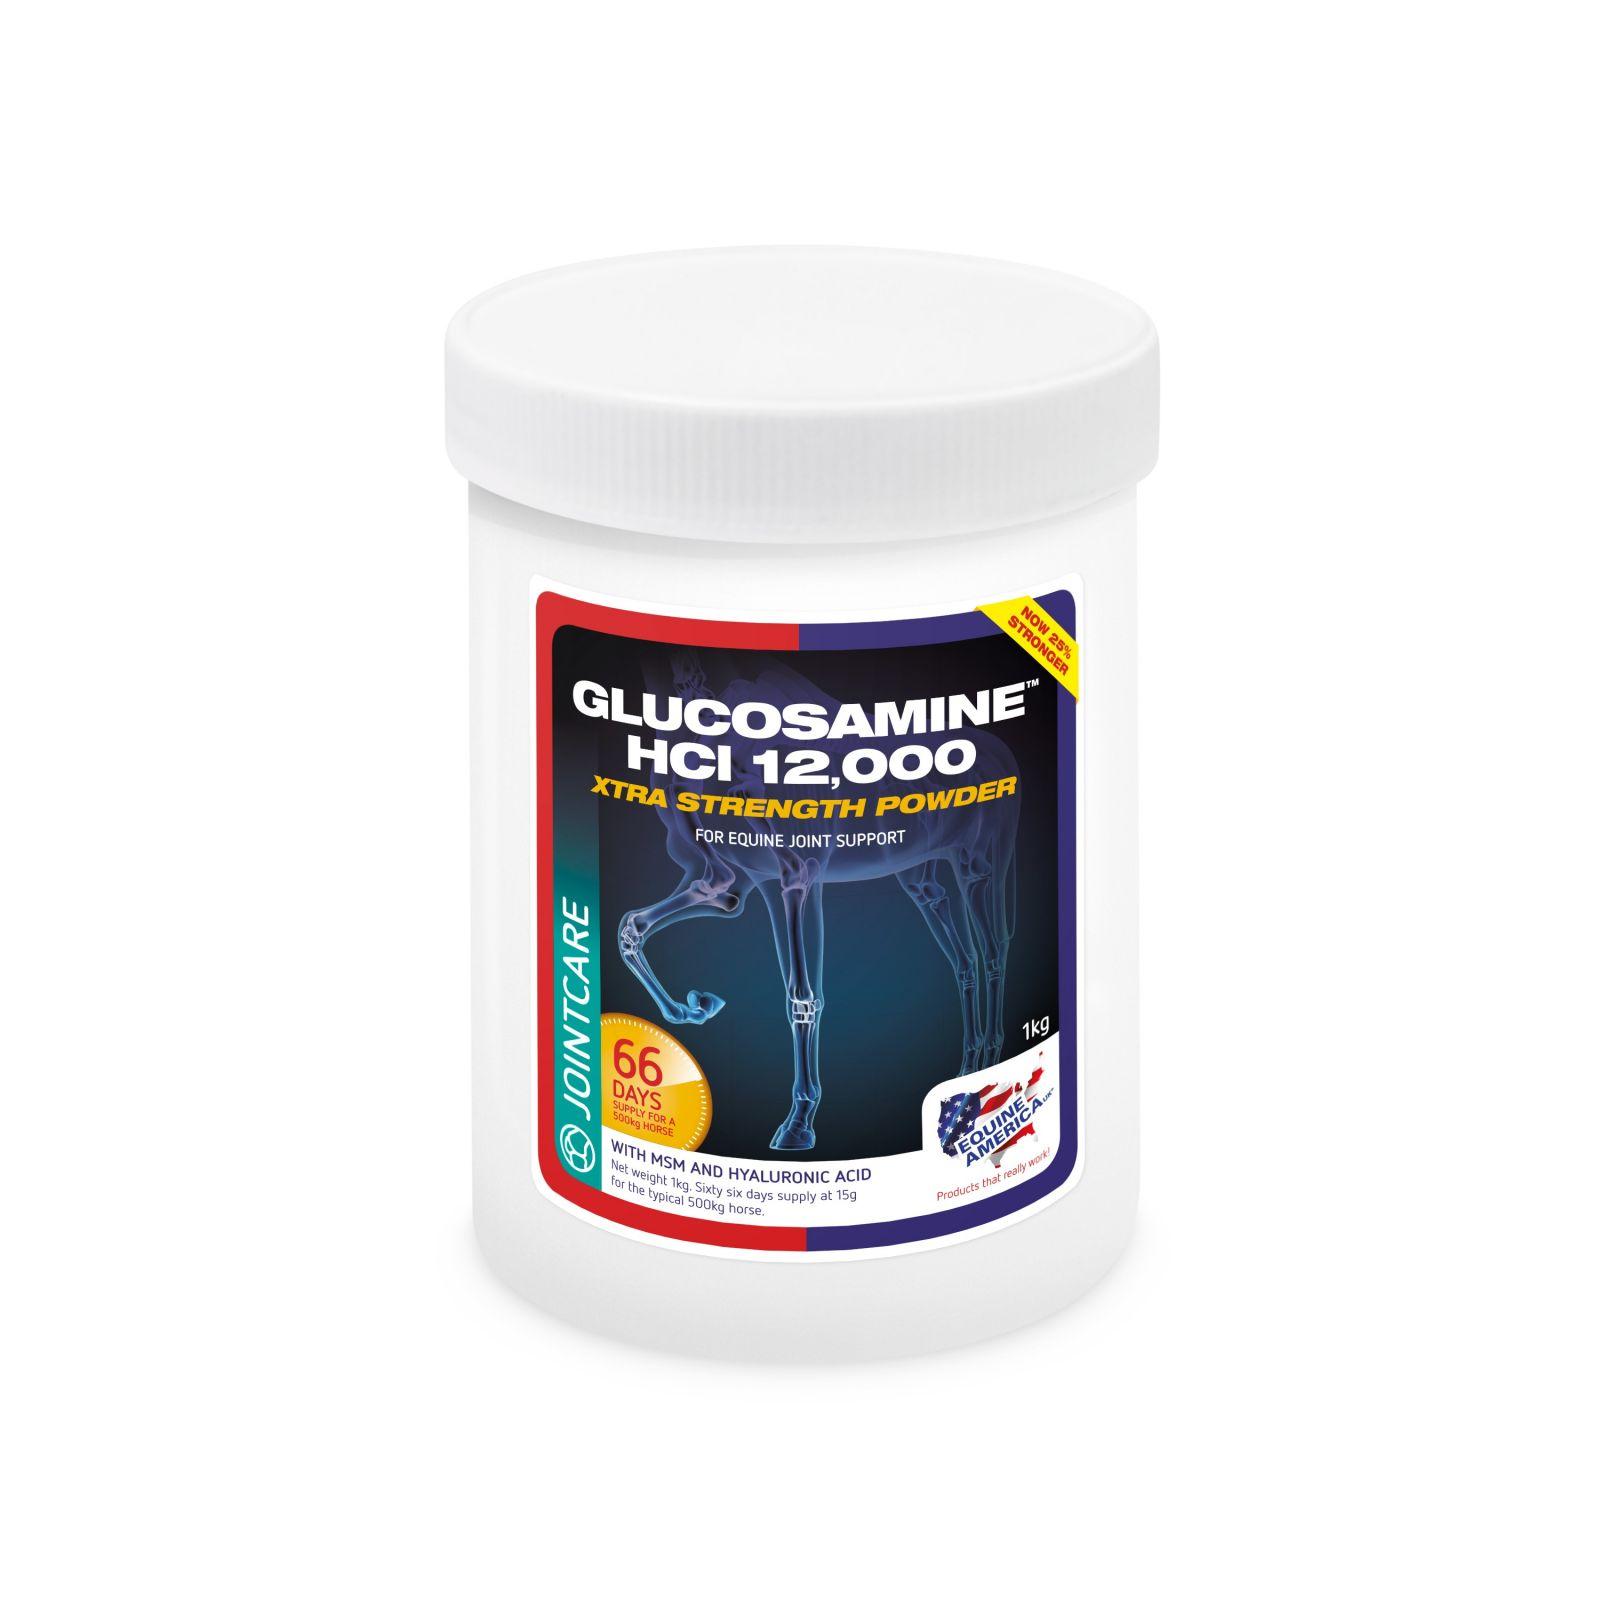 GLUCOSAMINE HCI 12,000 - Premium Quality